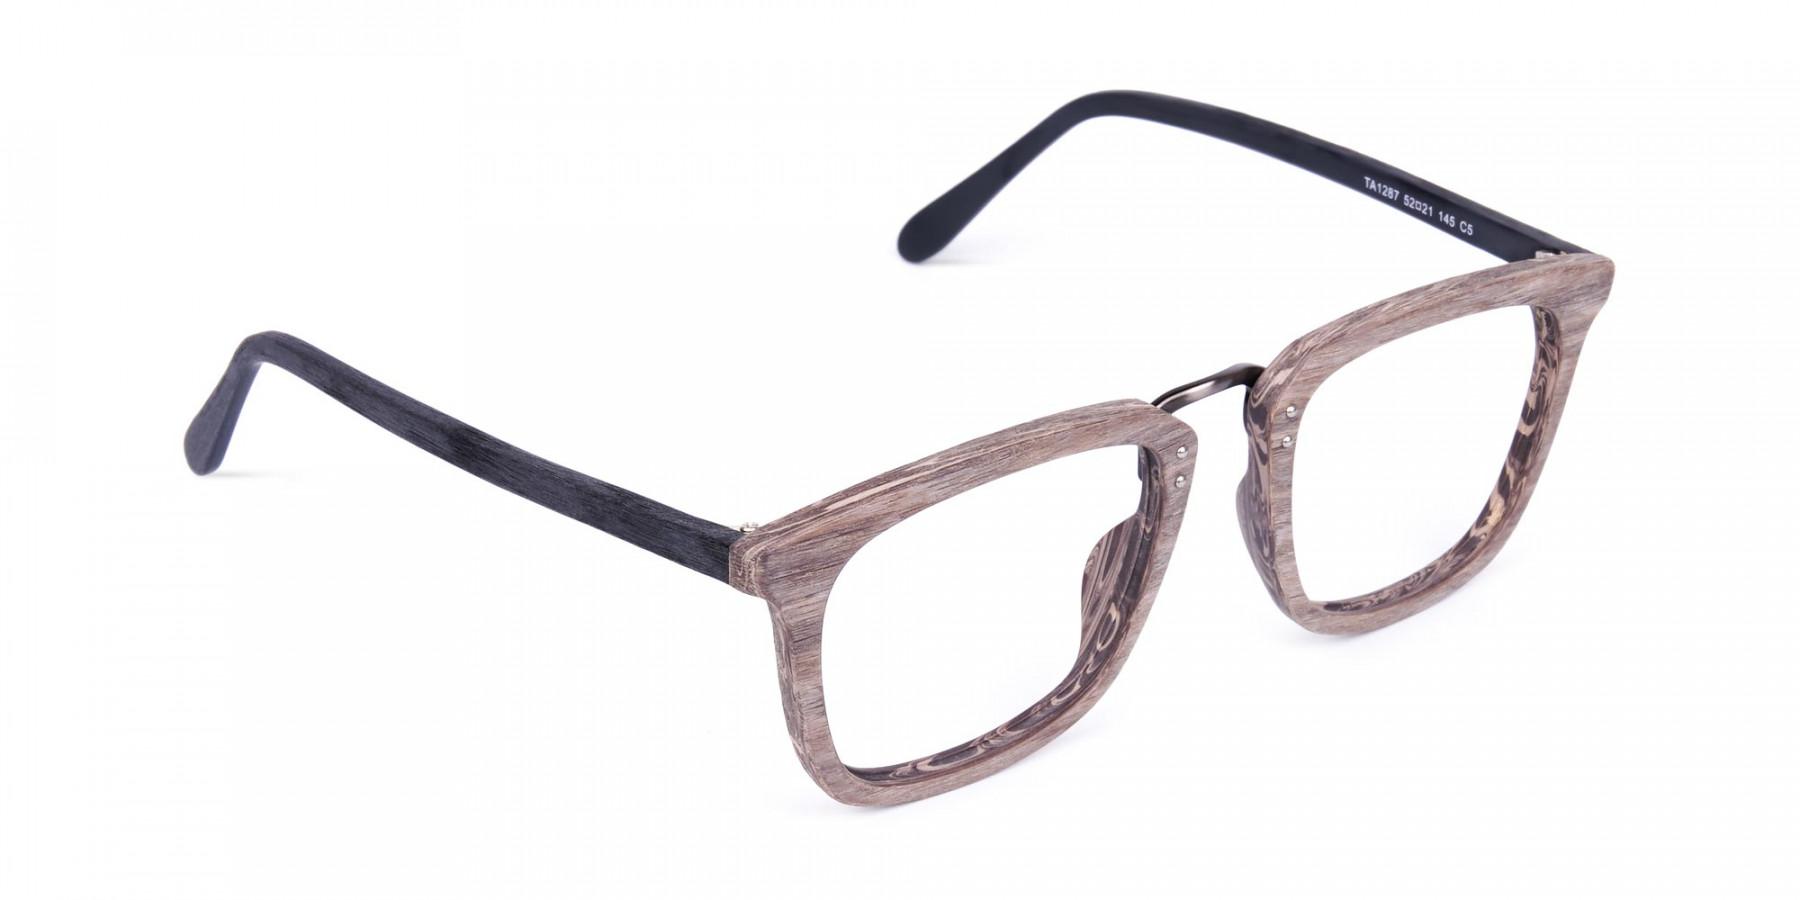 Wooden-Texture-Walnut-Brown-Rim-Glasses-1